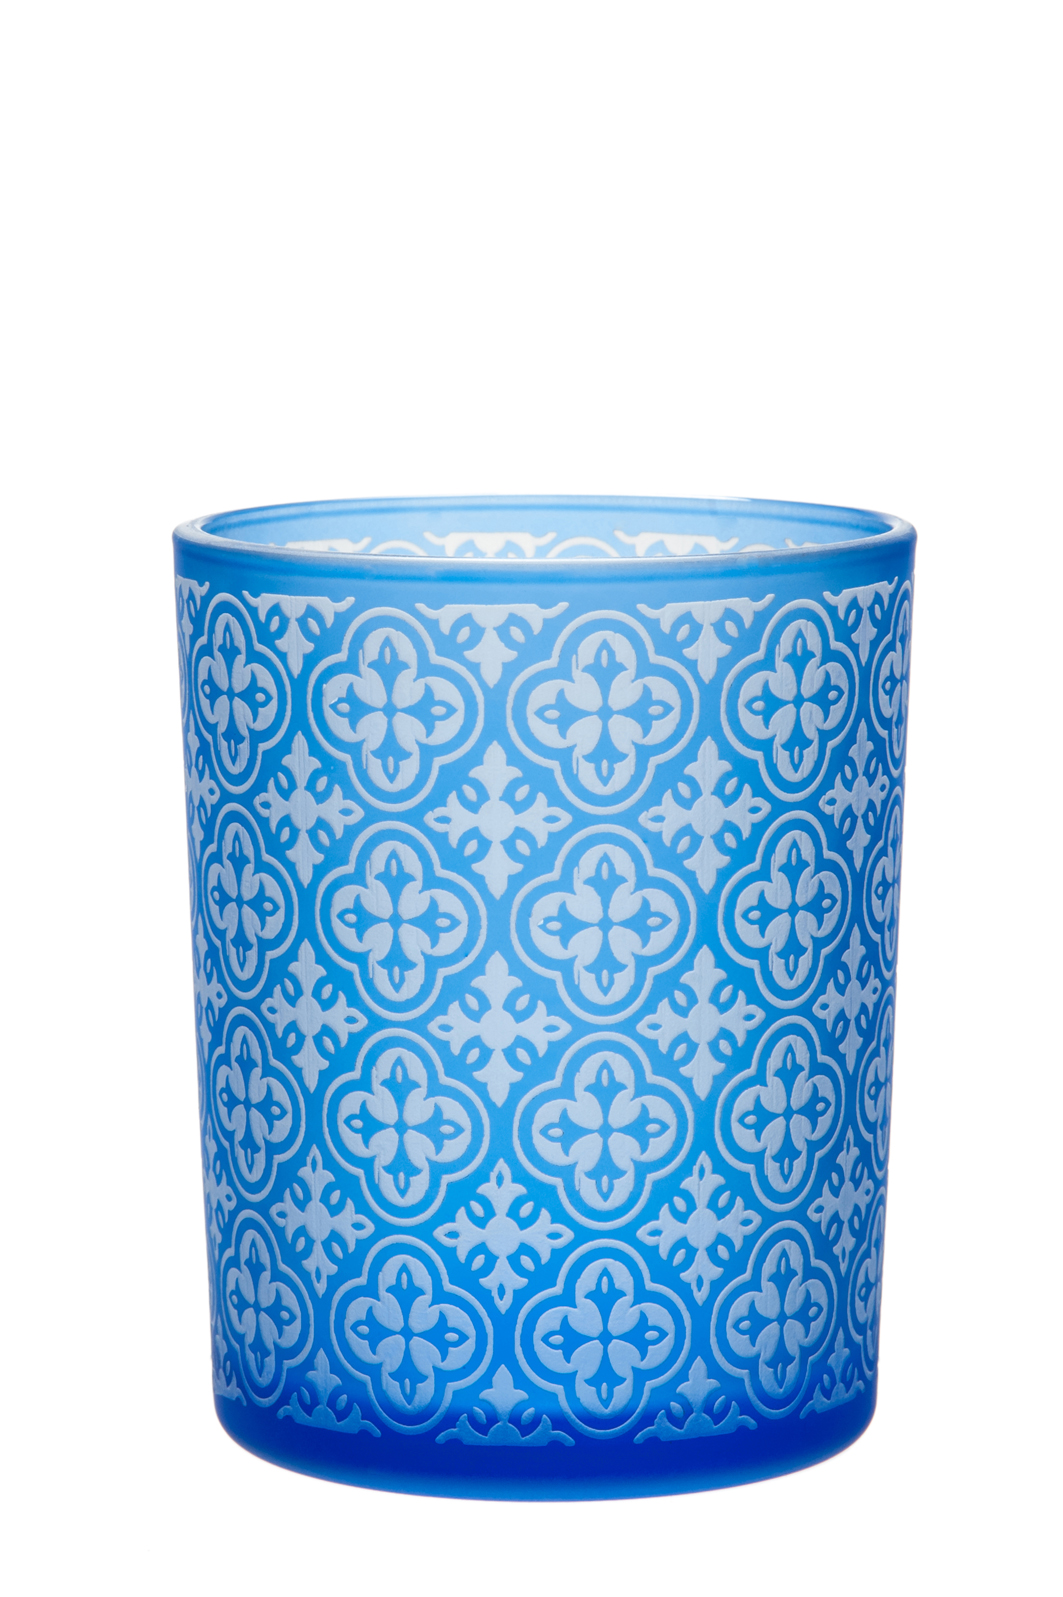 Portacandela vetro blu mobilia store for Mobilia store